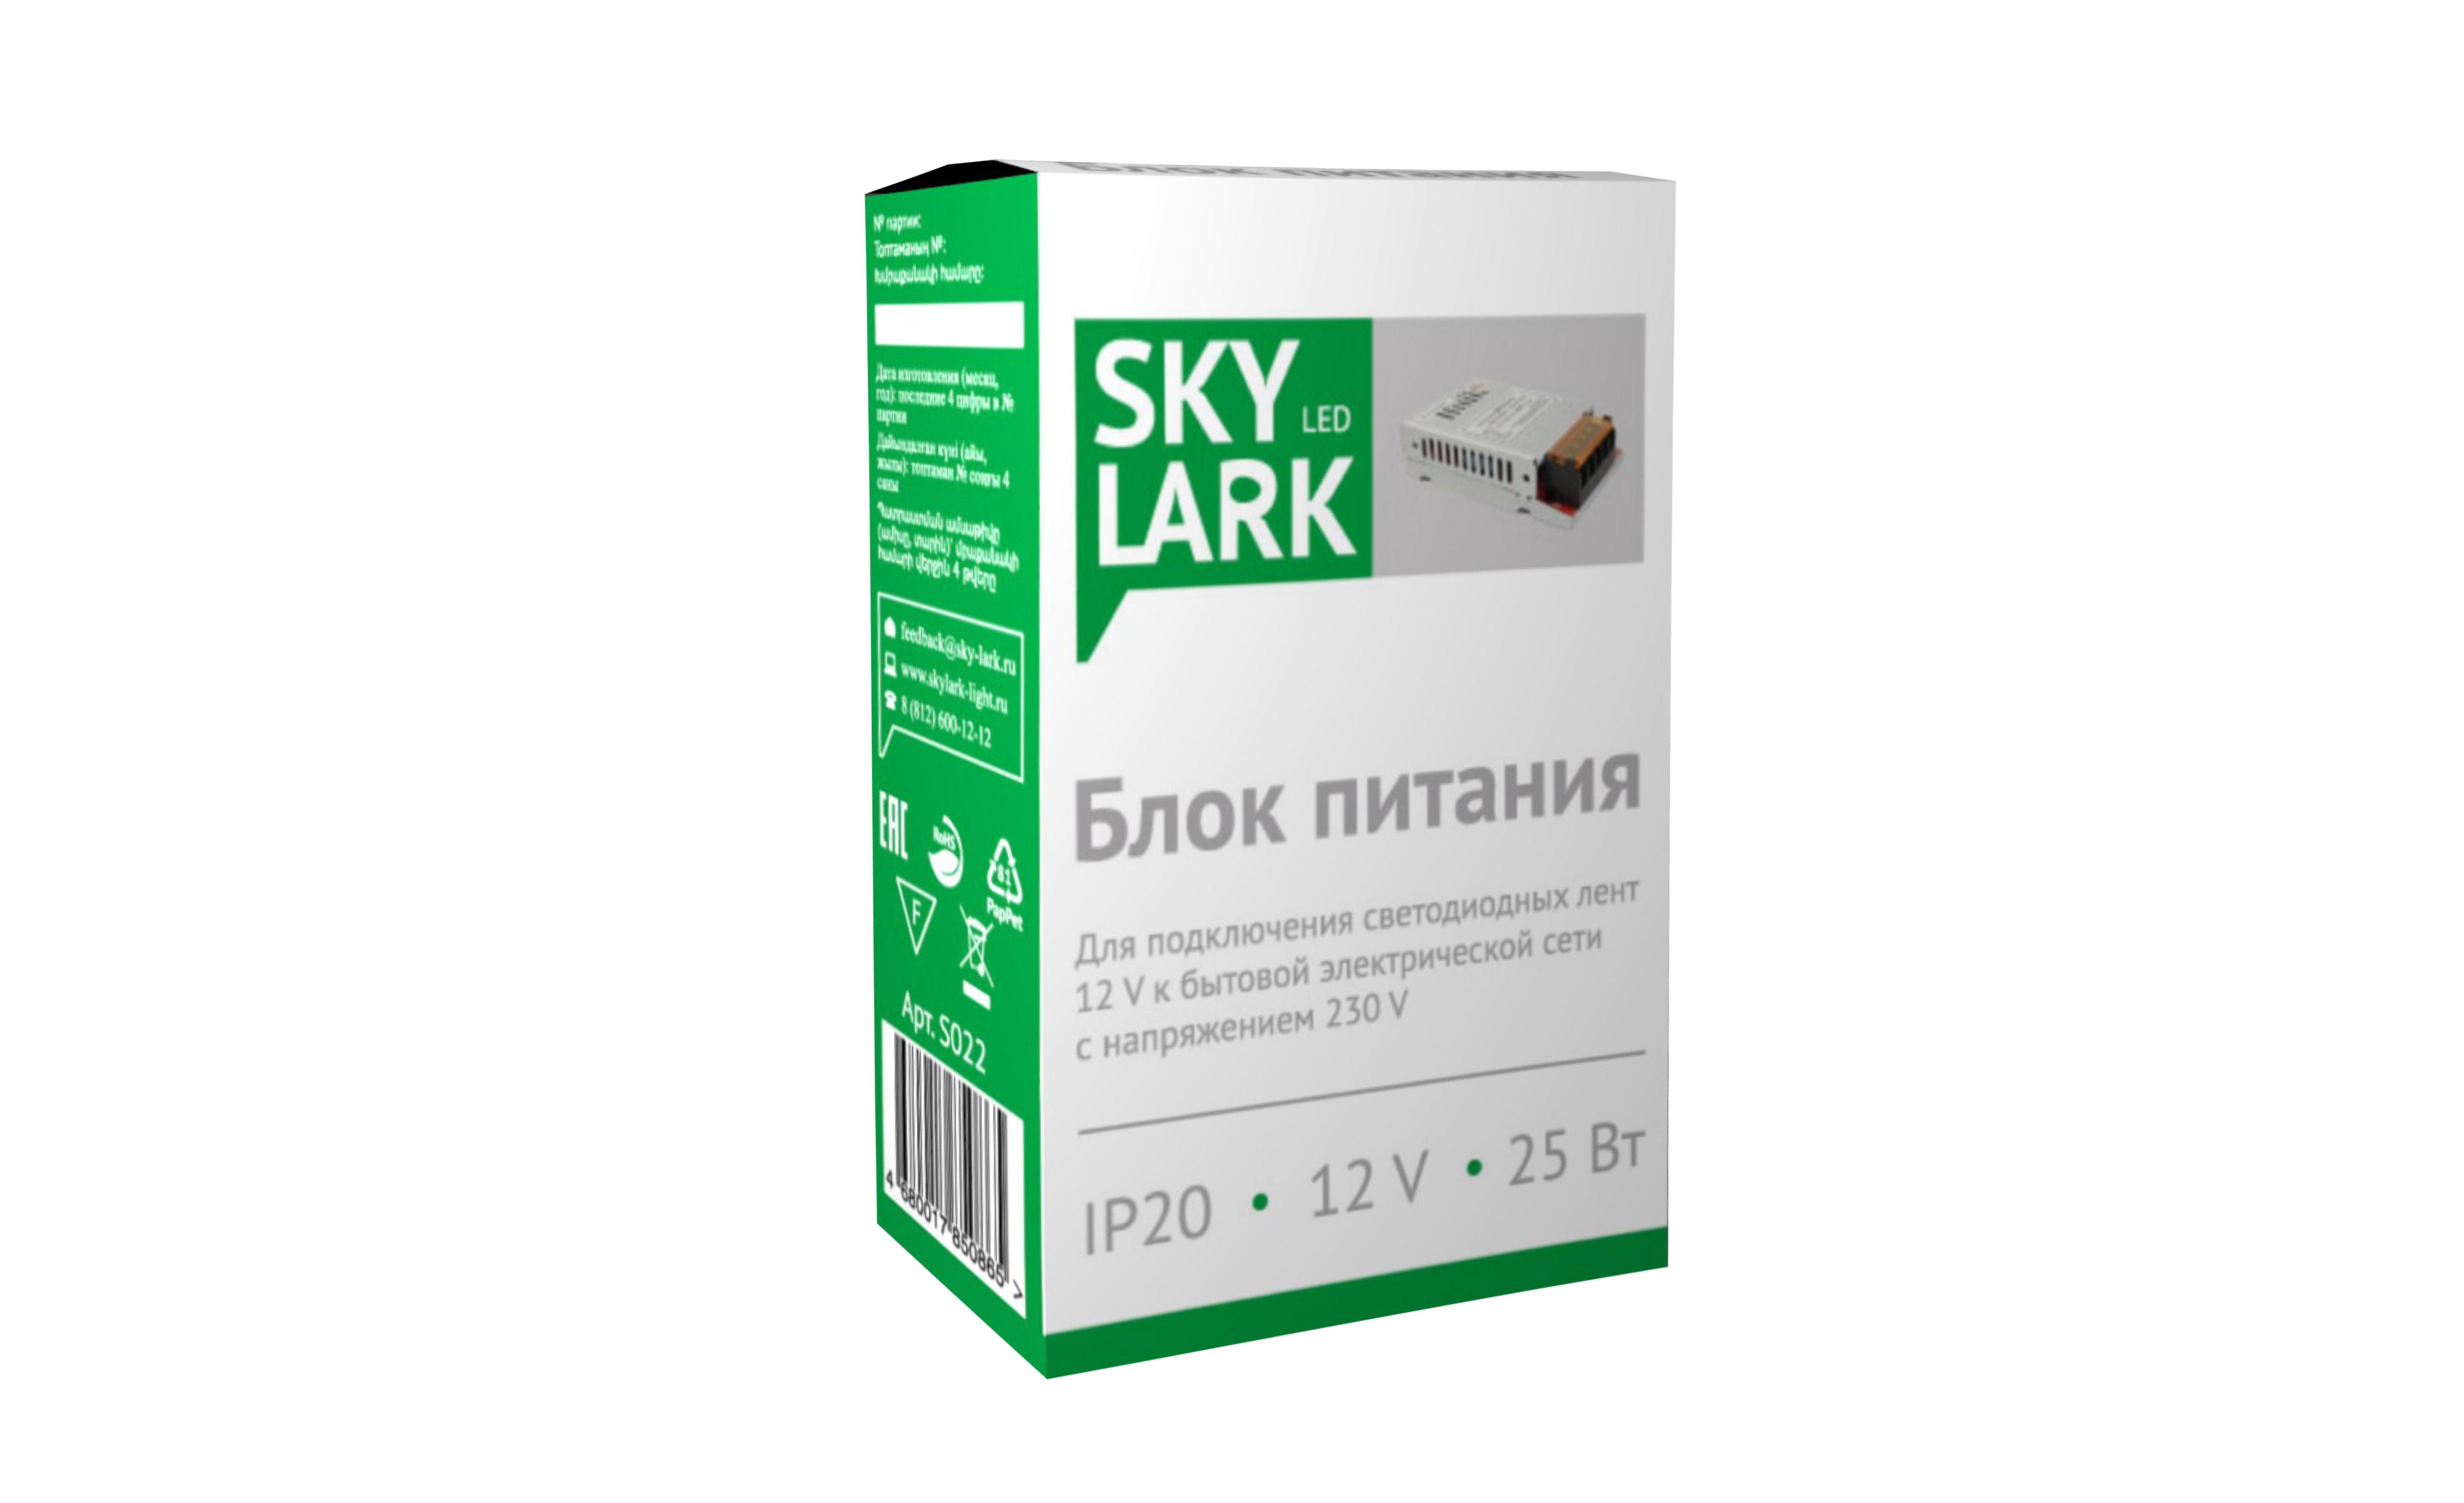 Блок питания Skylark S022